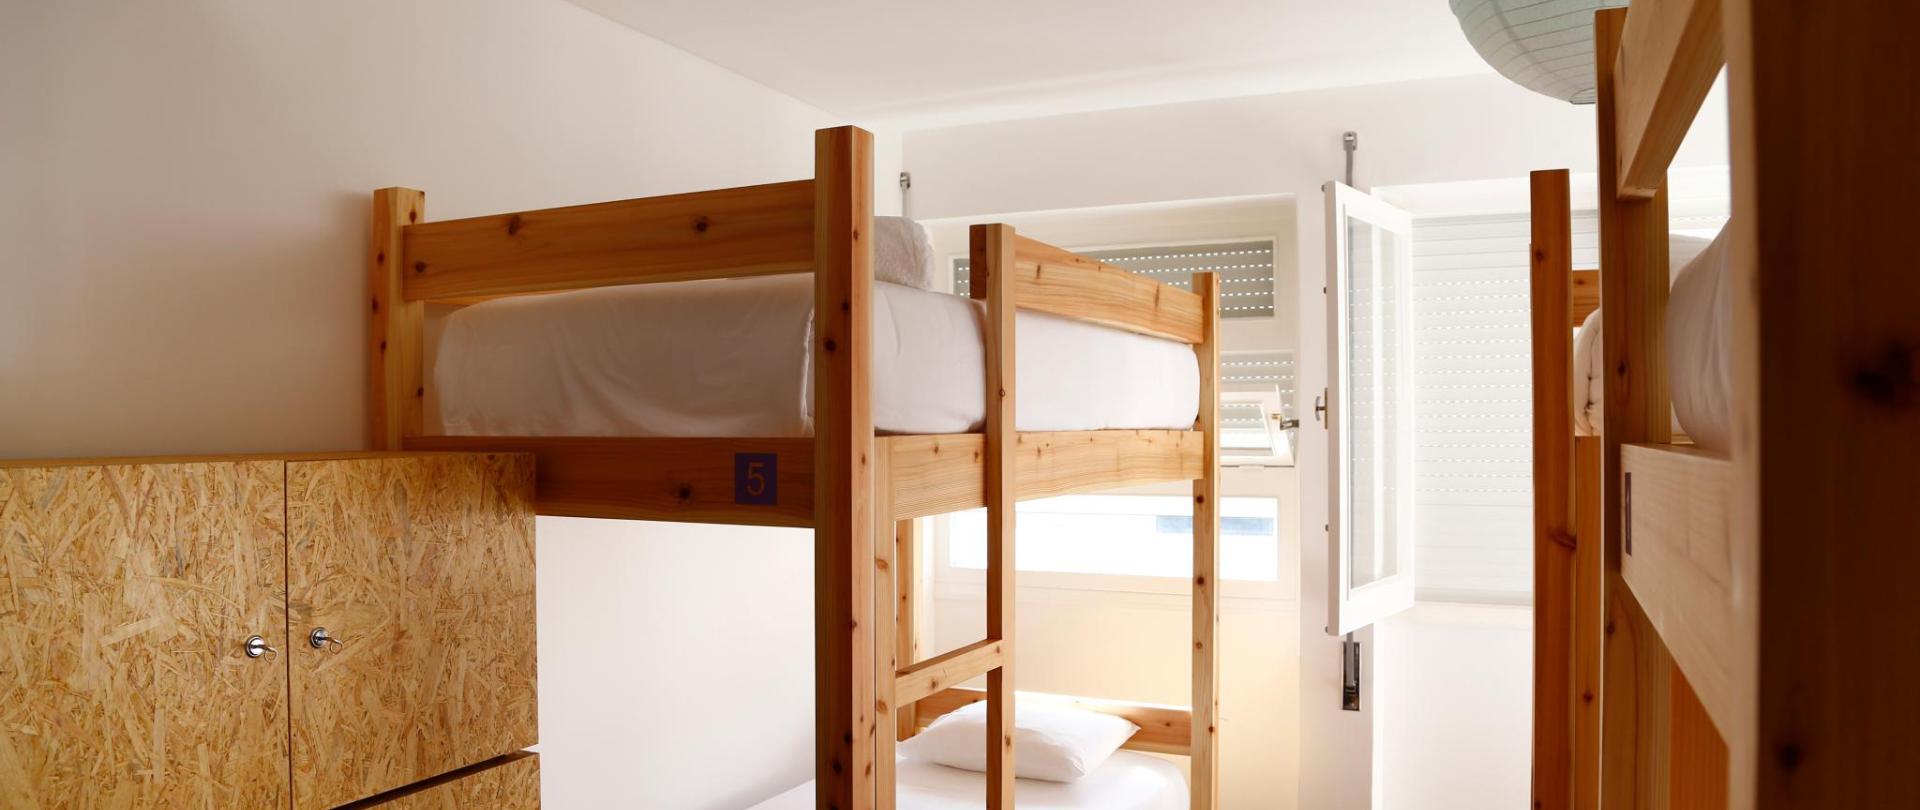 6 bed Dorm - City's Hostel Ponta Delgada (4) .jpg